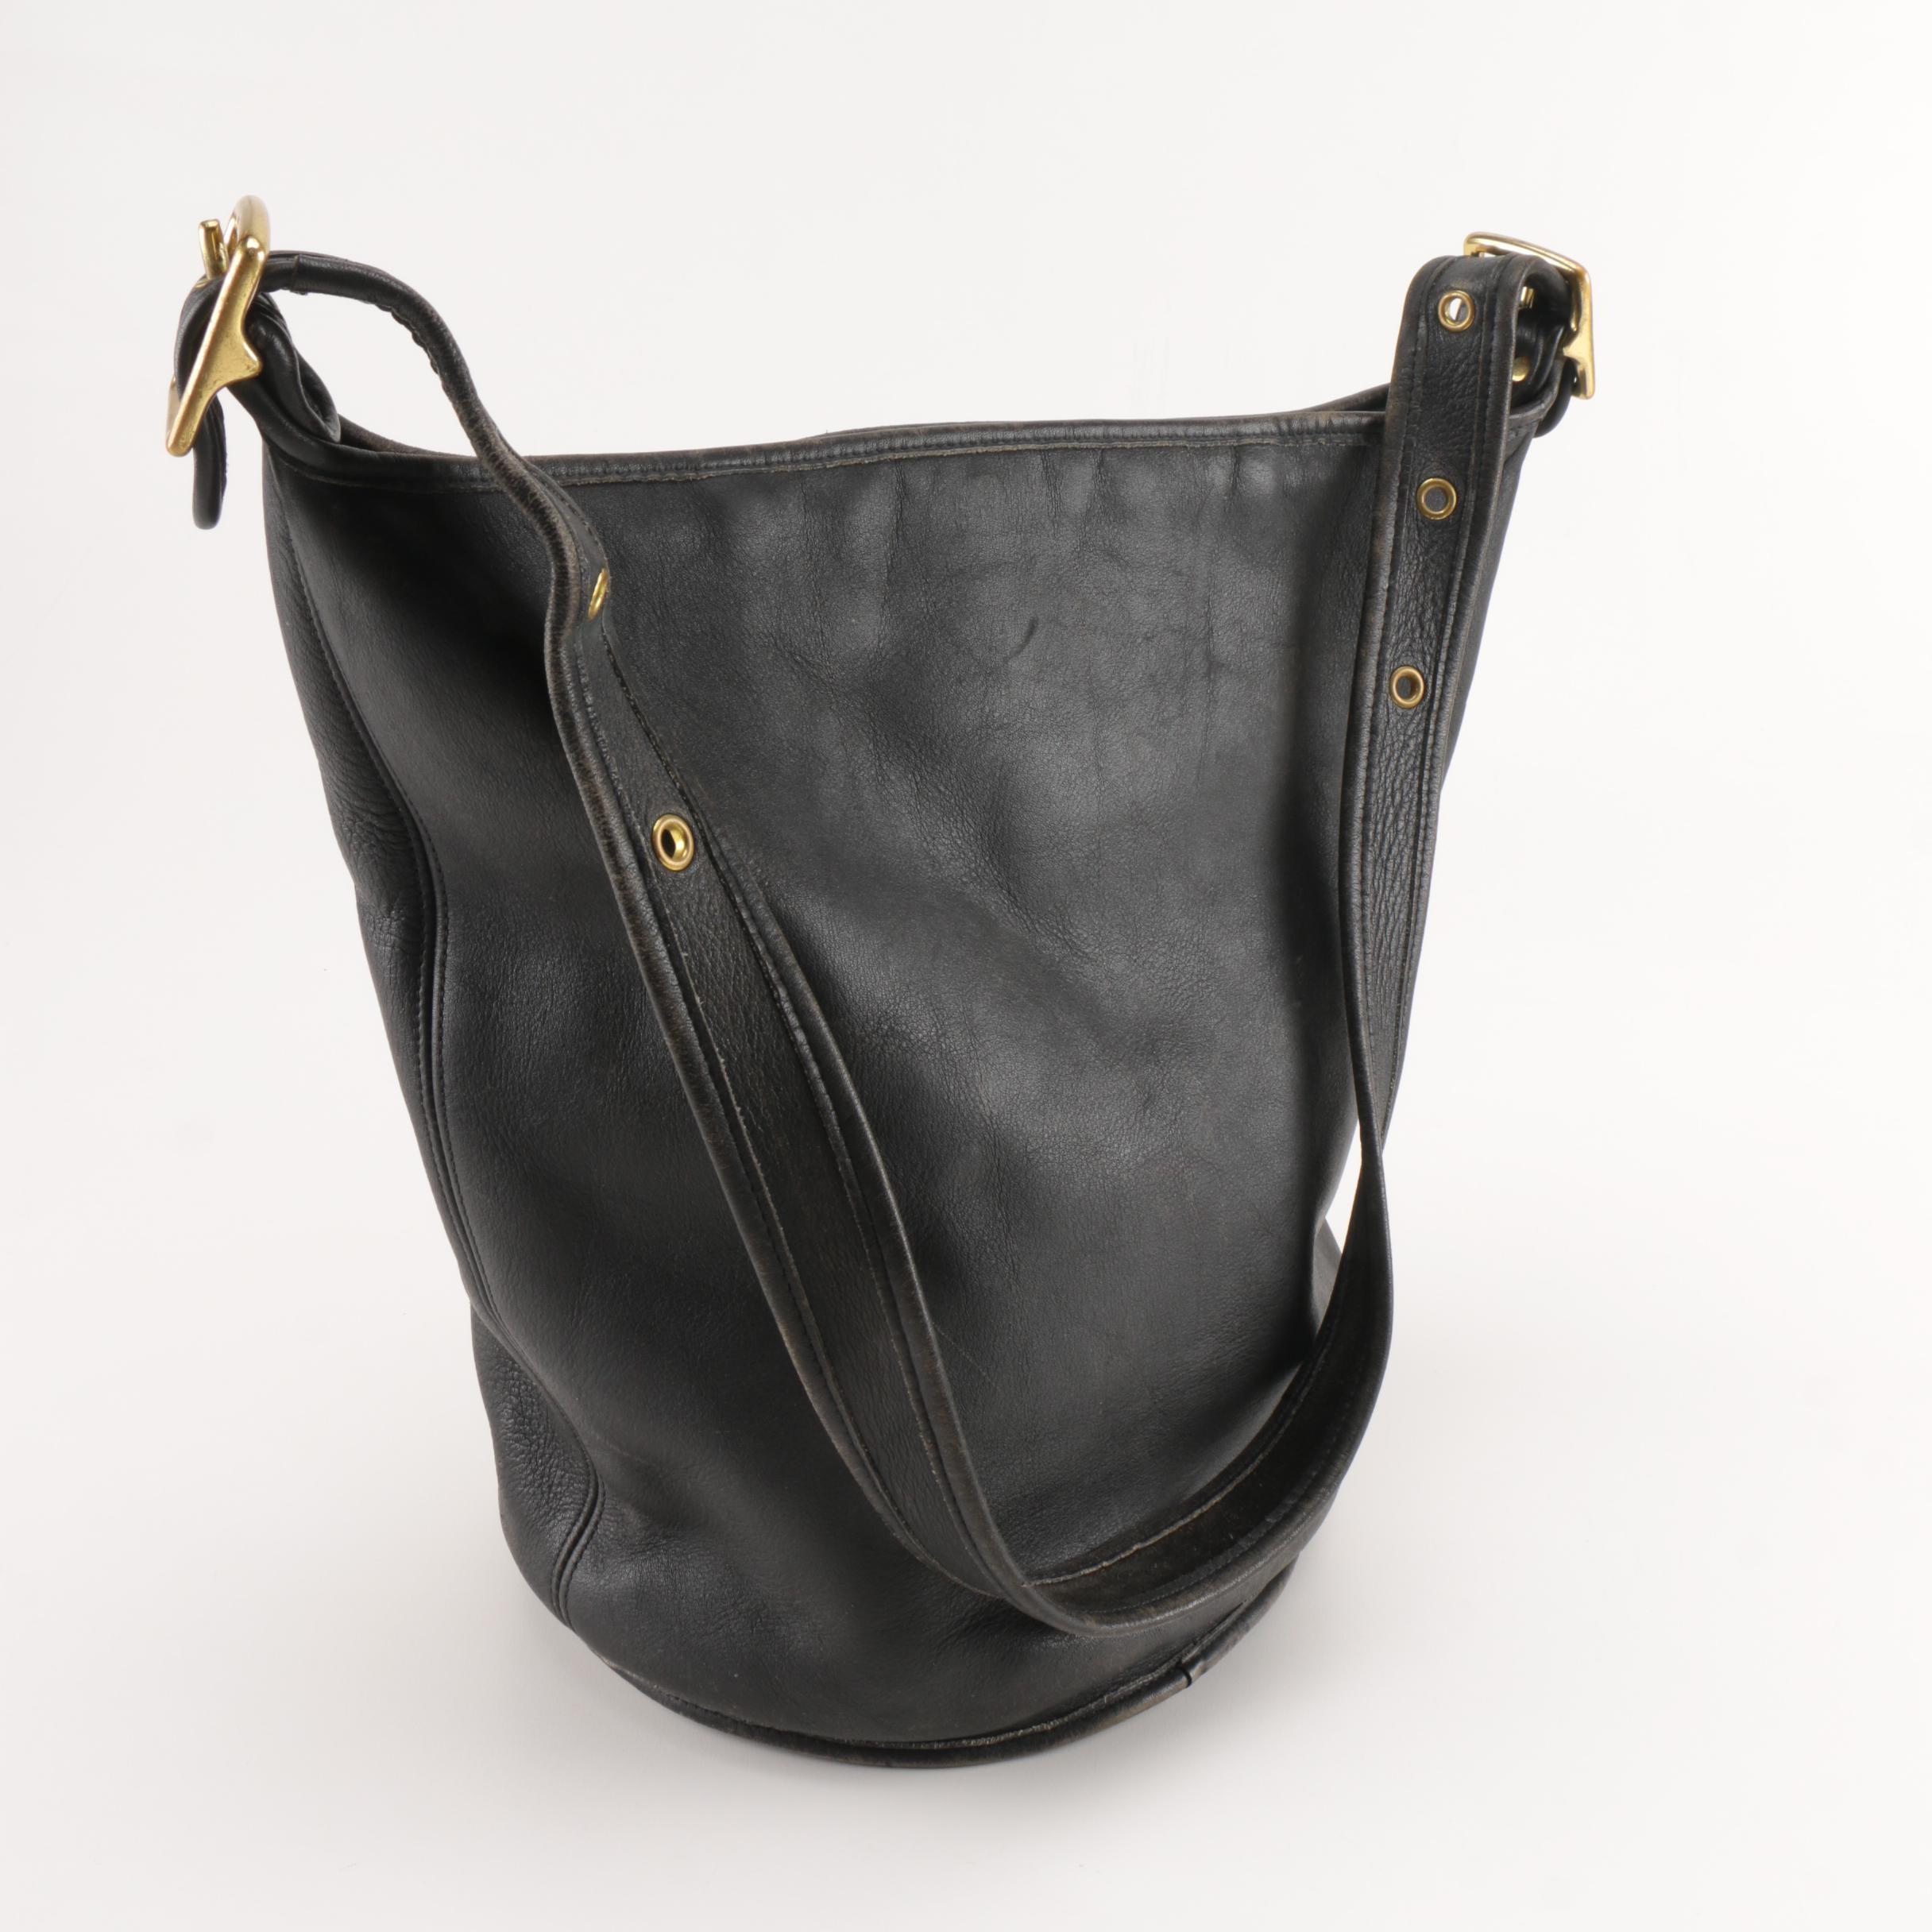 Vintage Coach Black Leather Bucket Tote